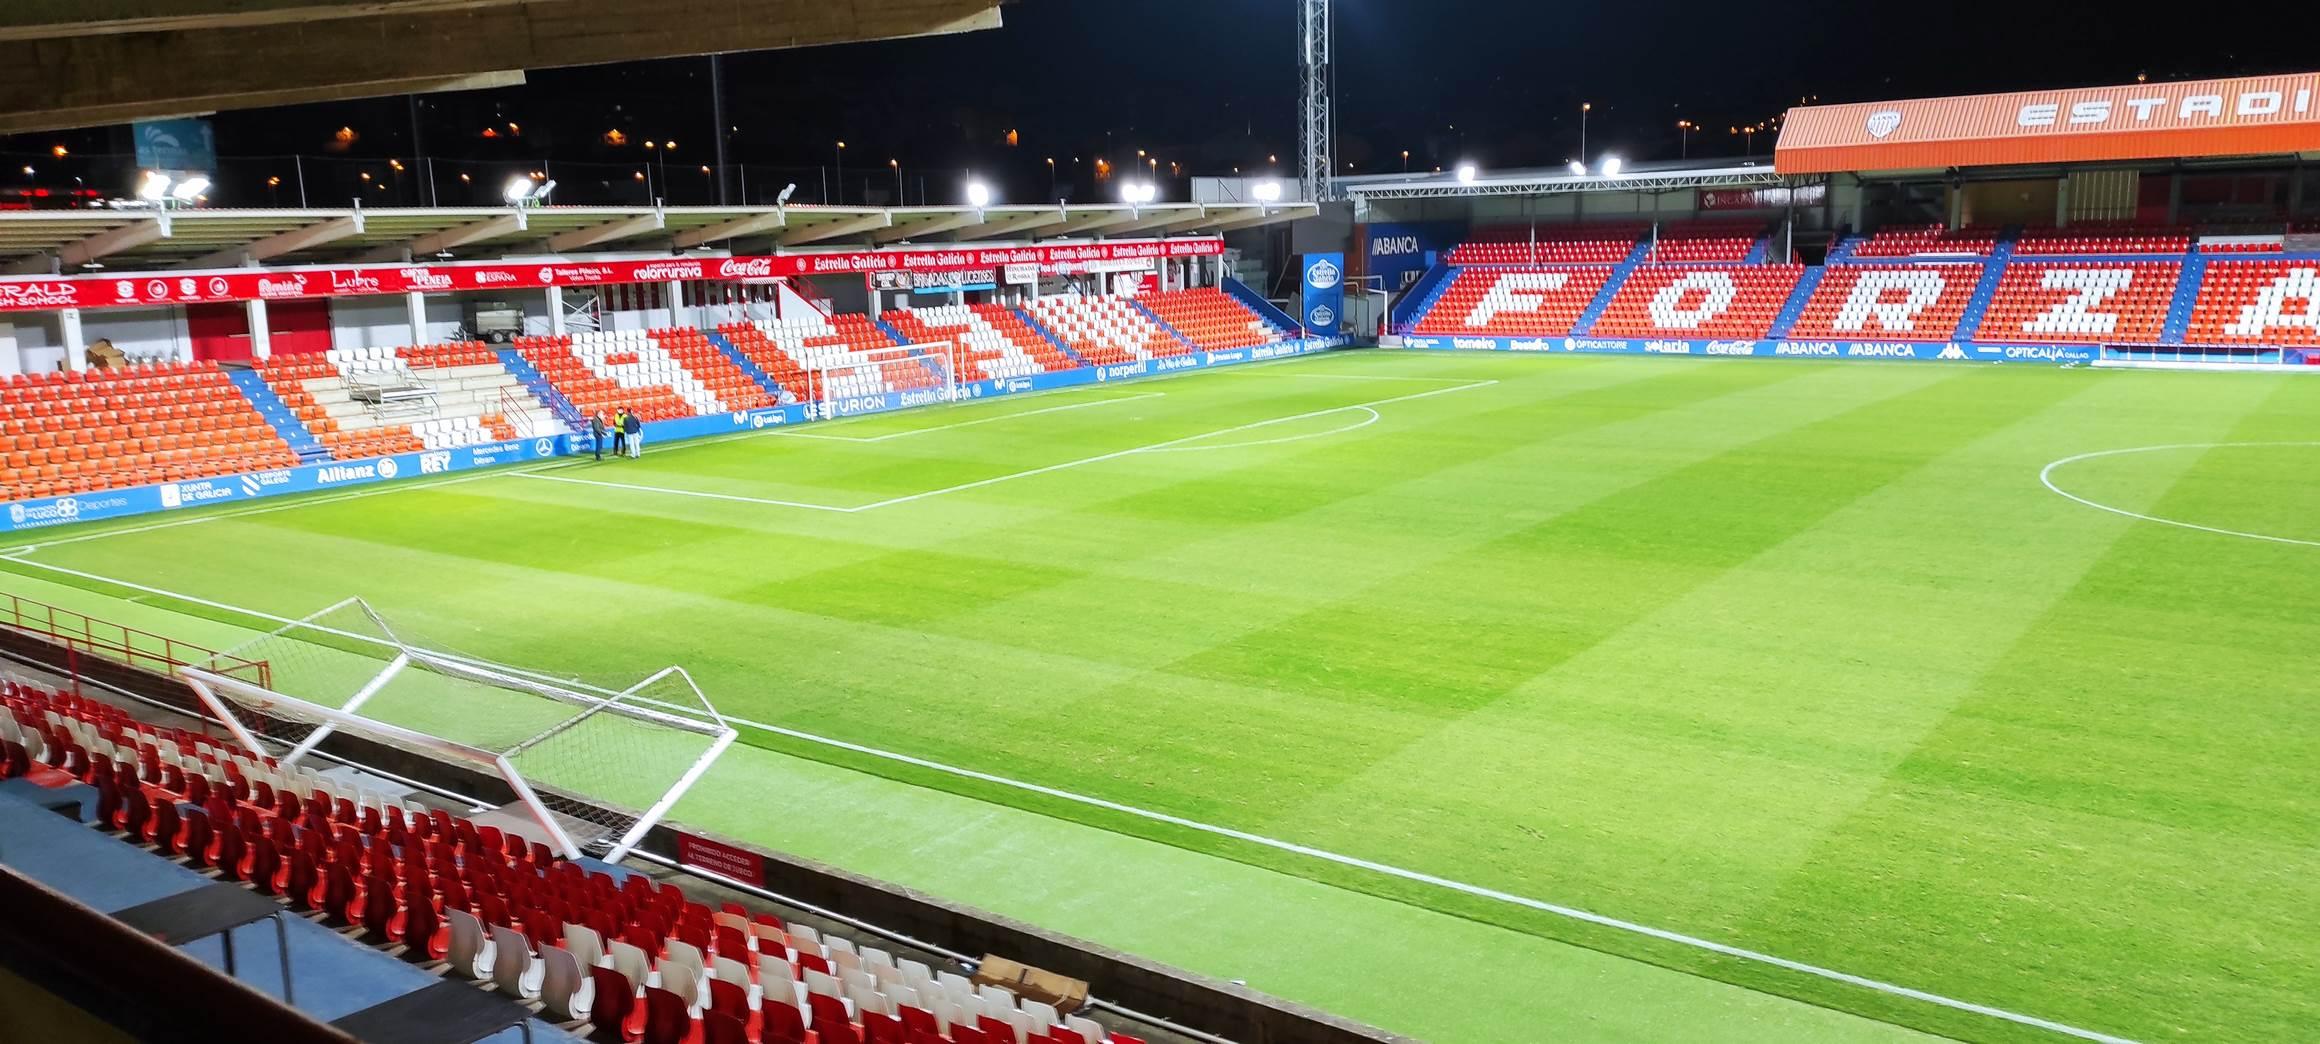 Estadio Ángel Carro (CD Lugo), Lugo